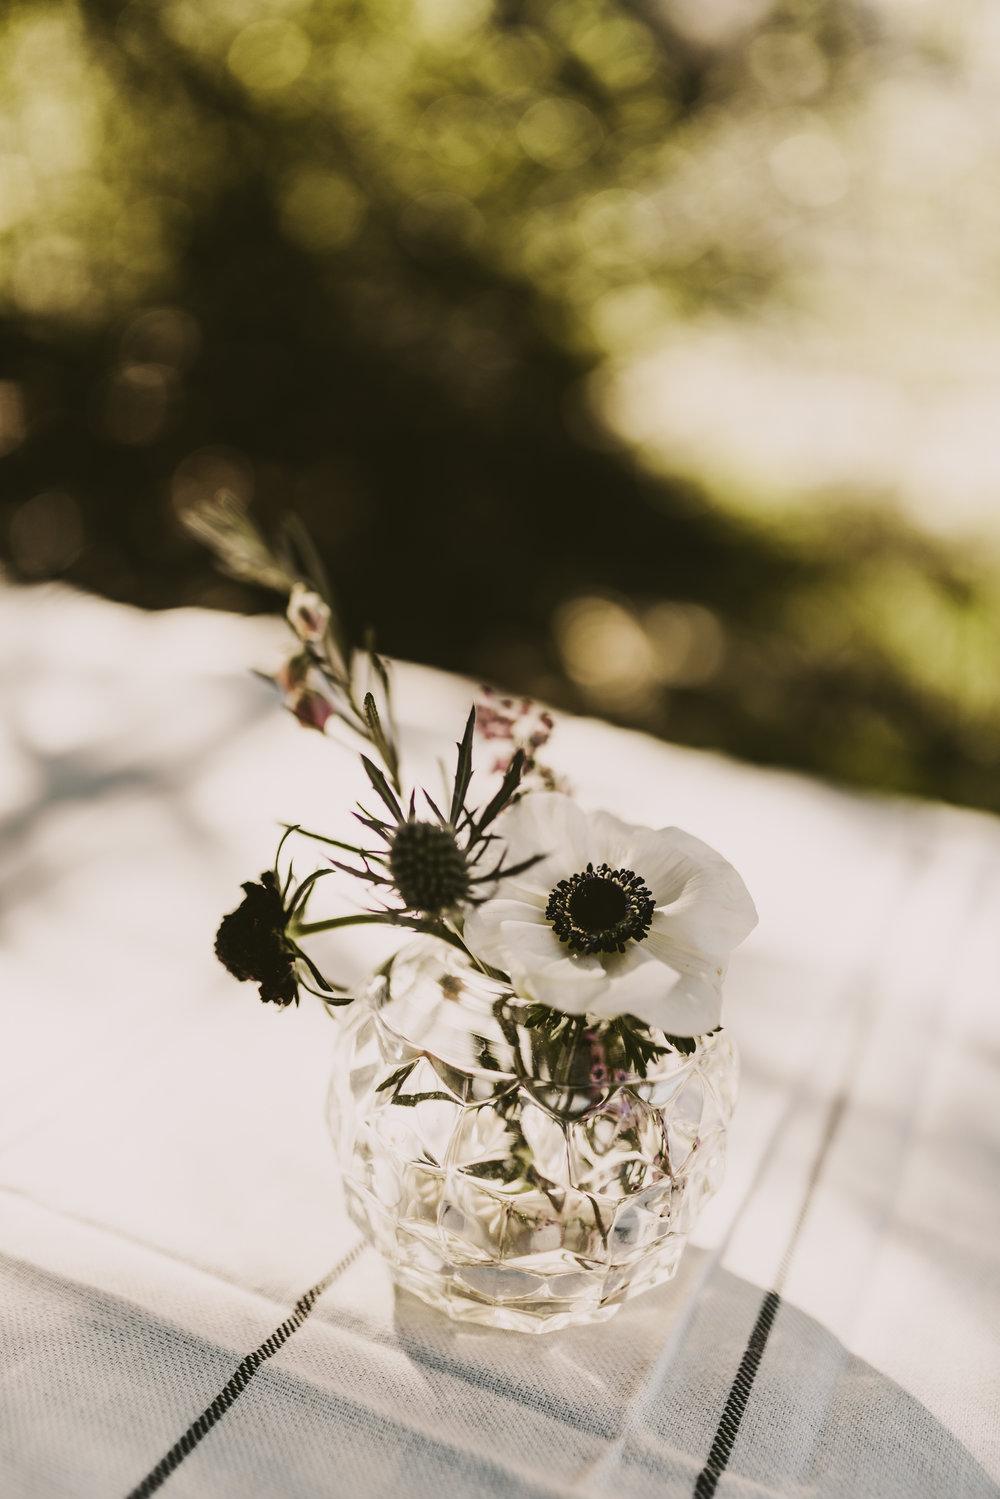 Isaiah+TaylorPhotography-Dan+MeghanElopement-140.jpg